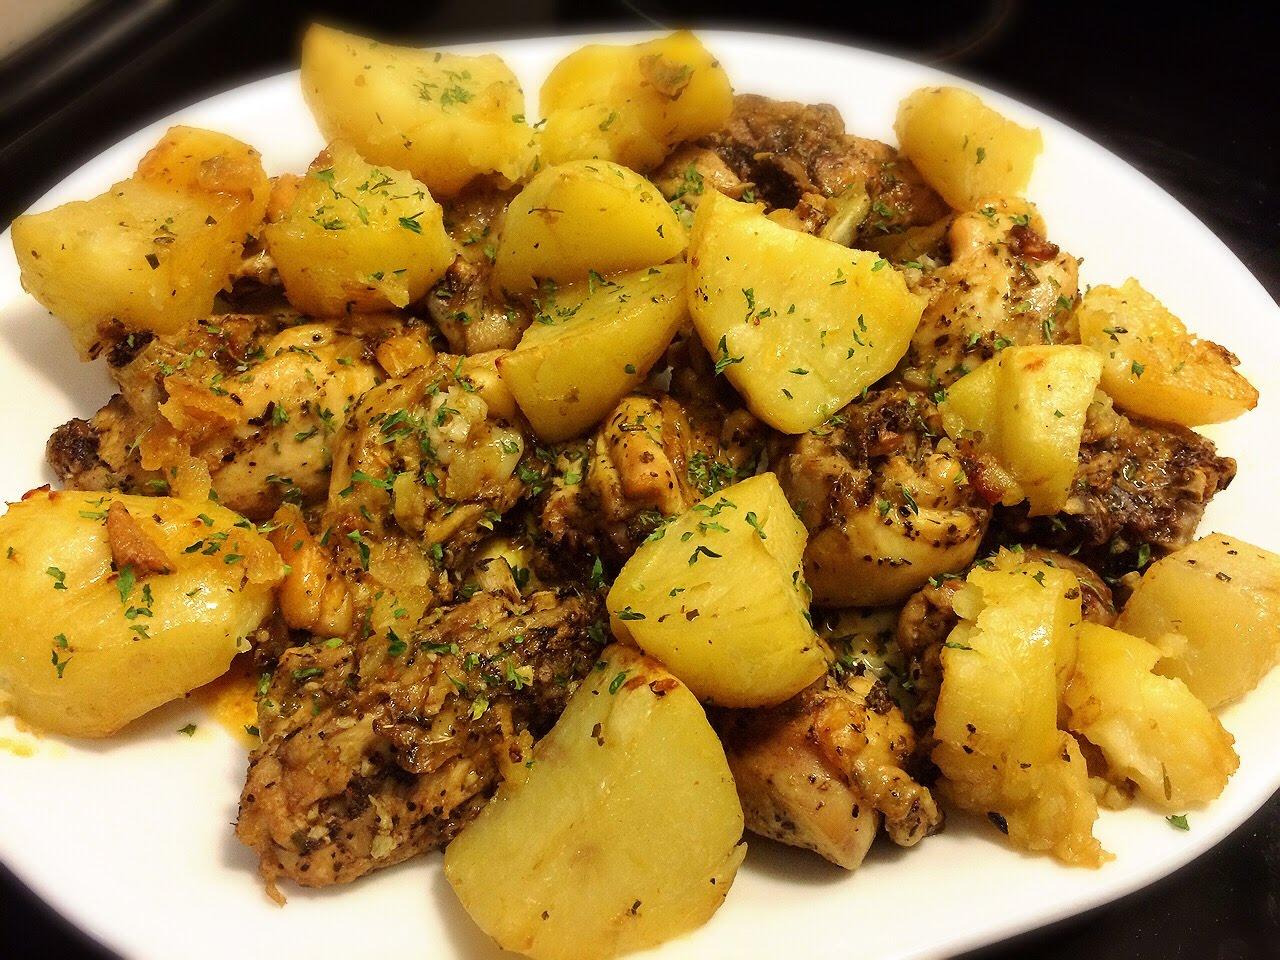 Easy to Make Greek Lemon Chicken & Potatoes